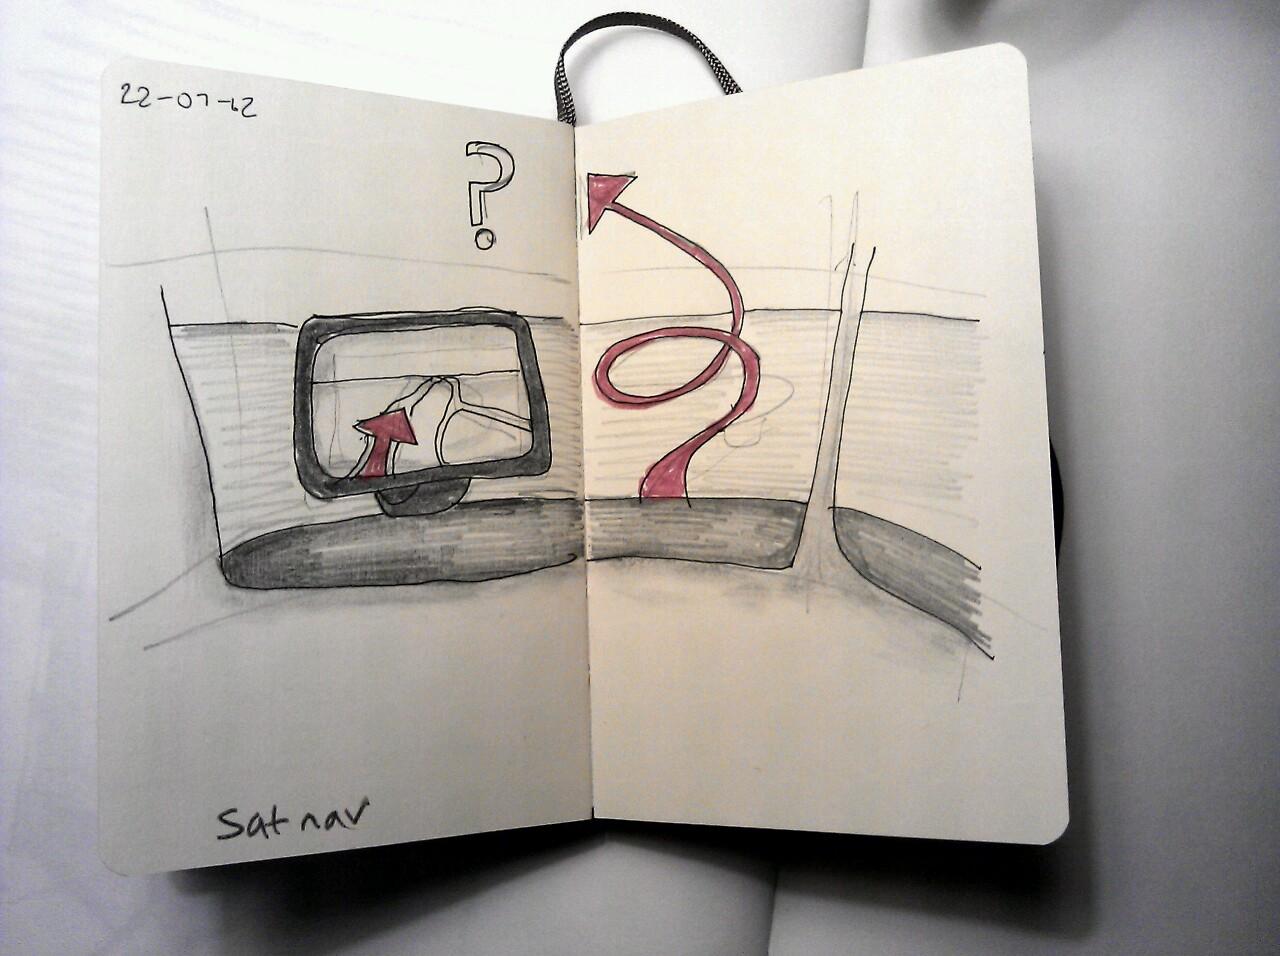 365 drawings later … day 173 … sat nav